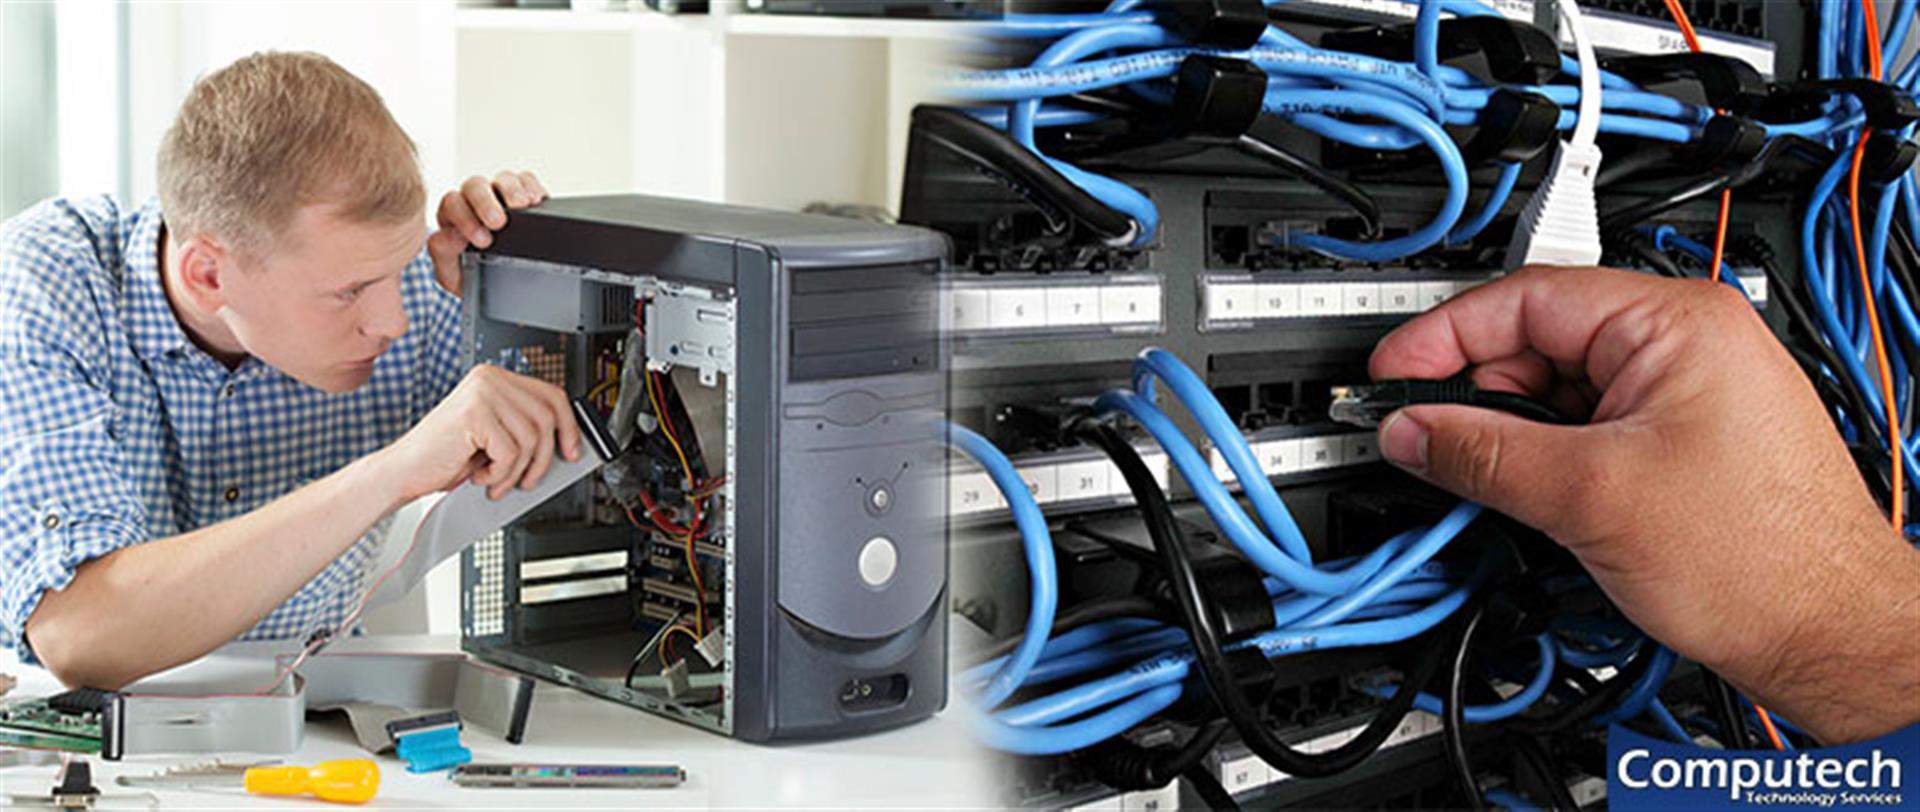 Semmes Alabama Onsite PC & Printer Repair, Networking, Telecom & Data Cabling Solutions